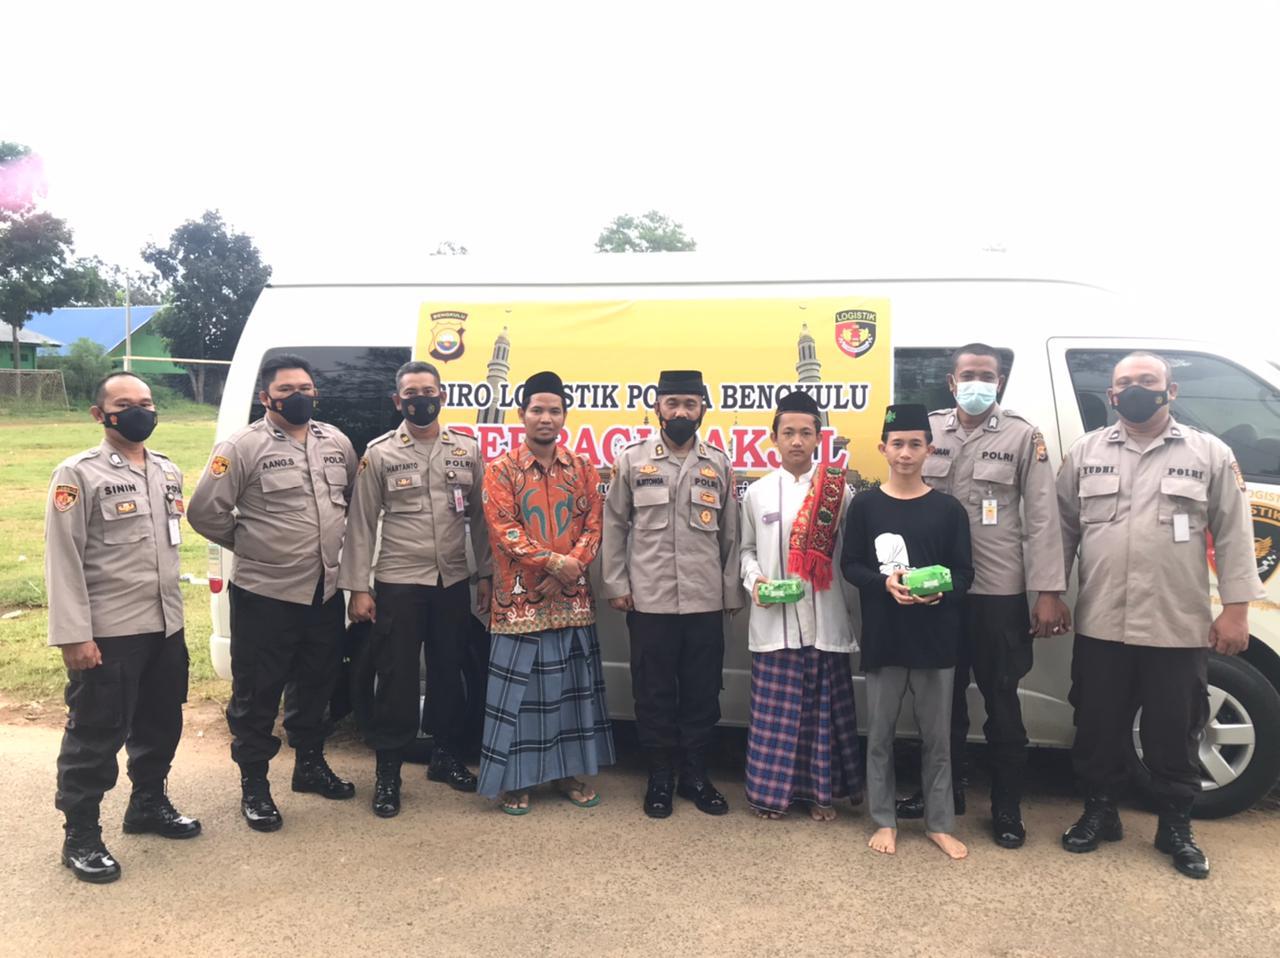 Peduli Sesama di Bulan Ramadhan, Polda Bengkulu Bagikan 110 Takjil